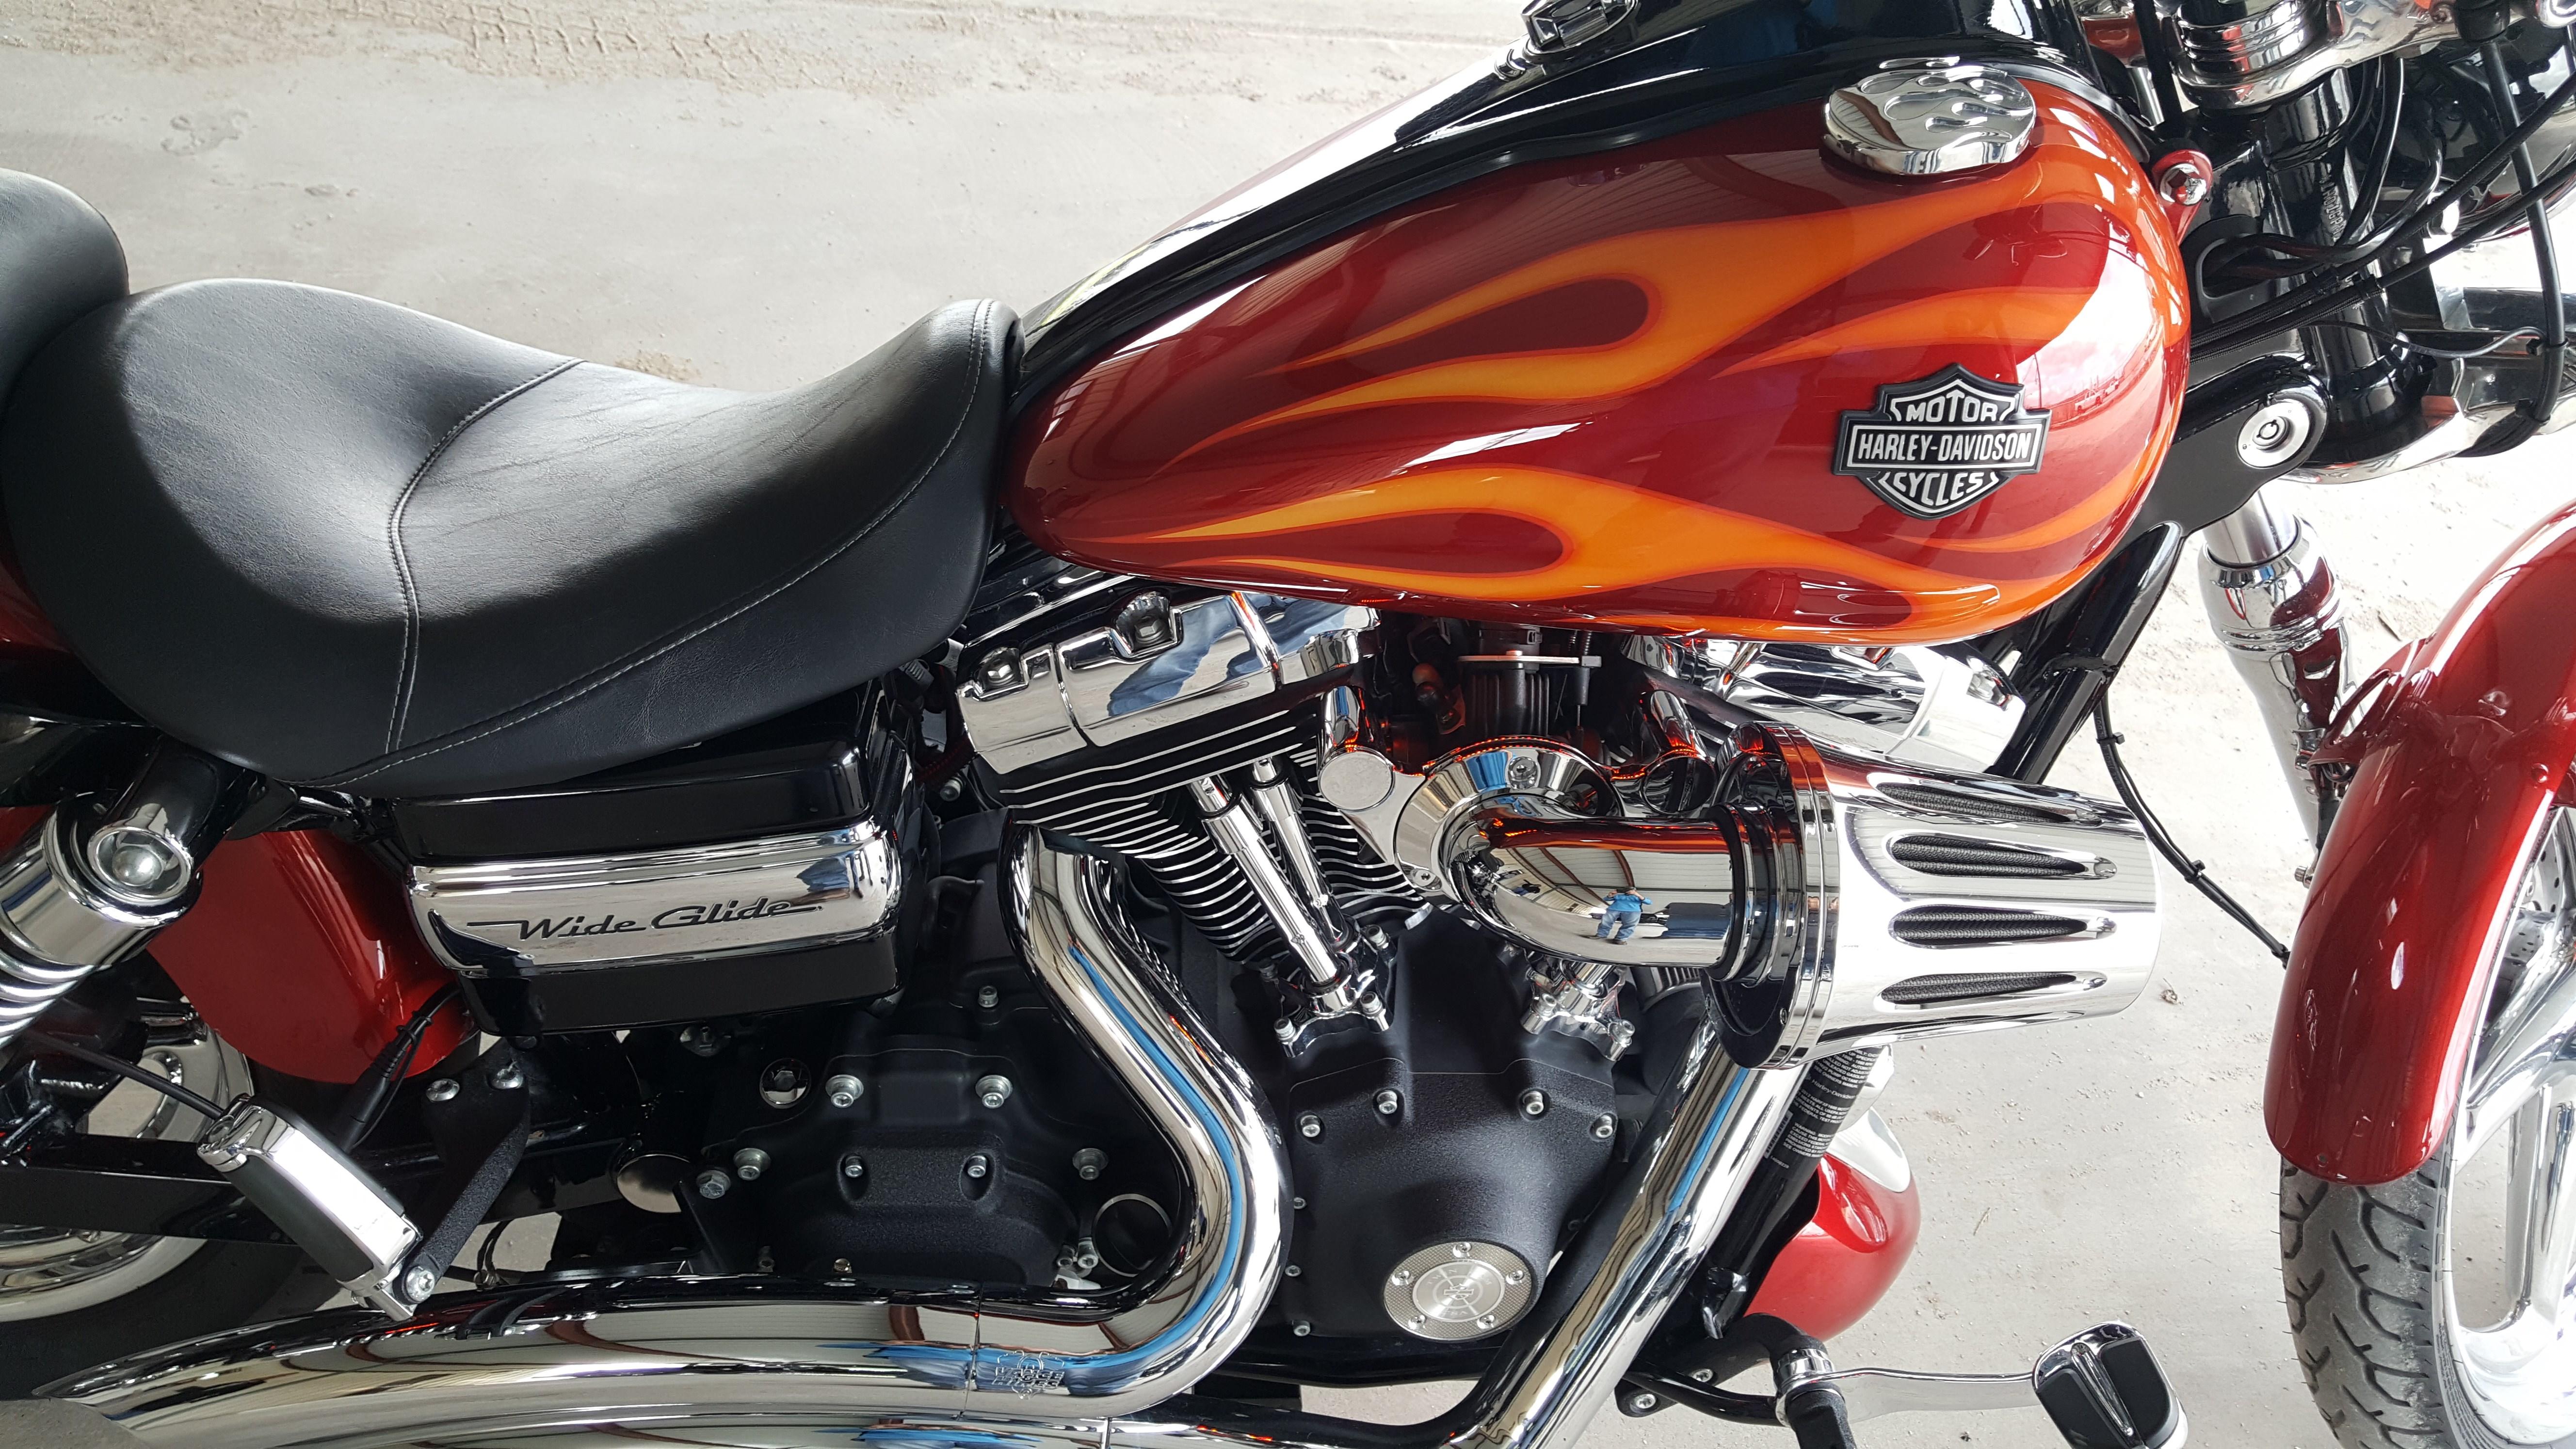 Harley Davidson Motorcycles Tinley Park